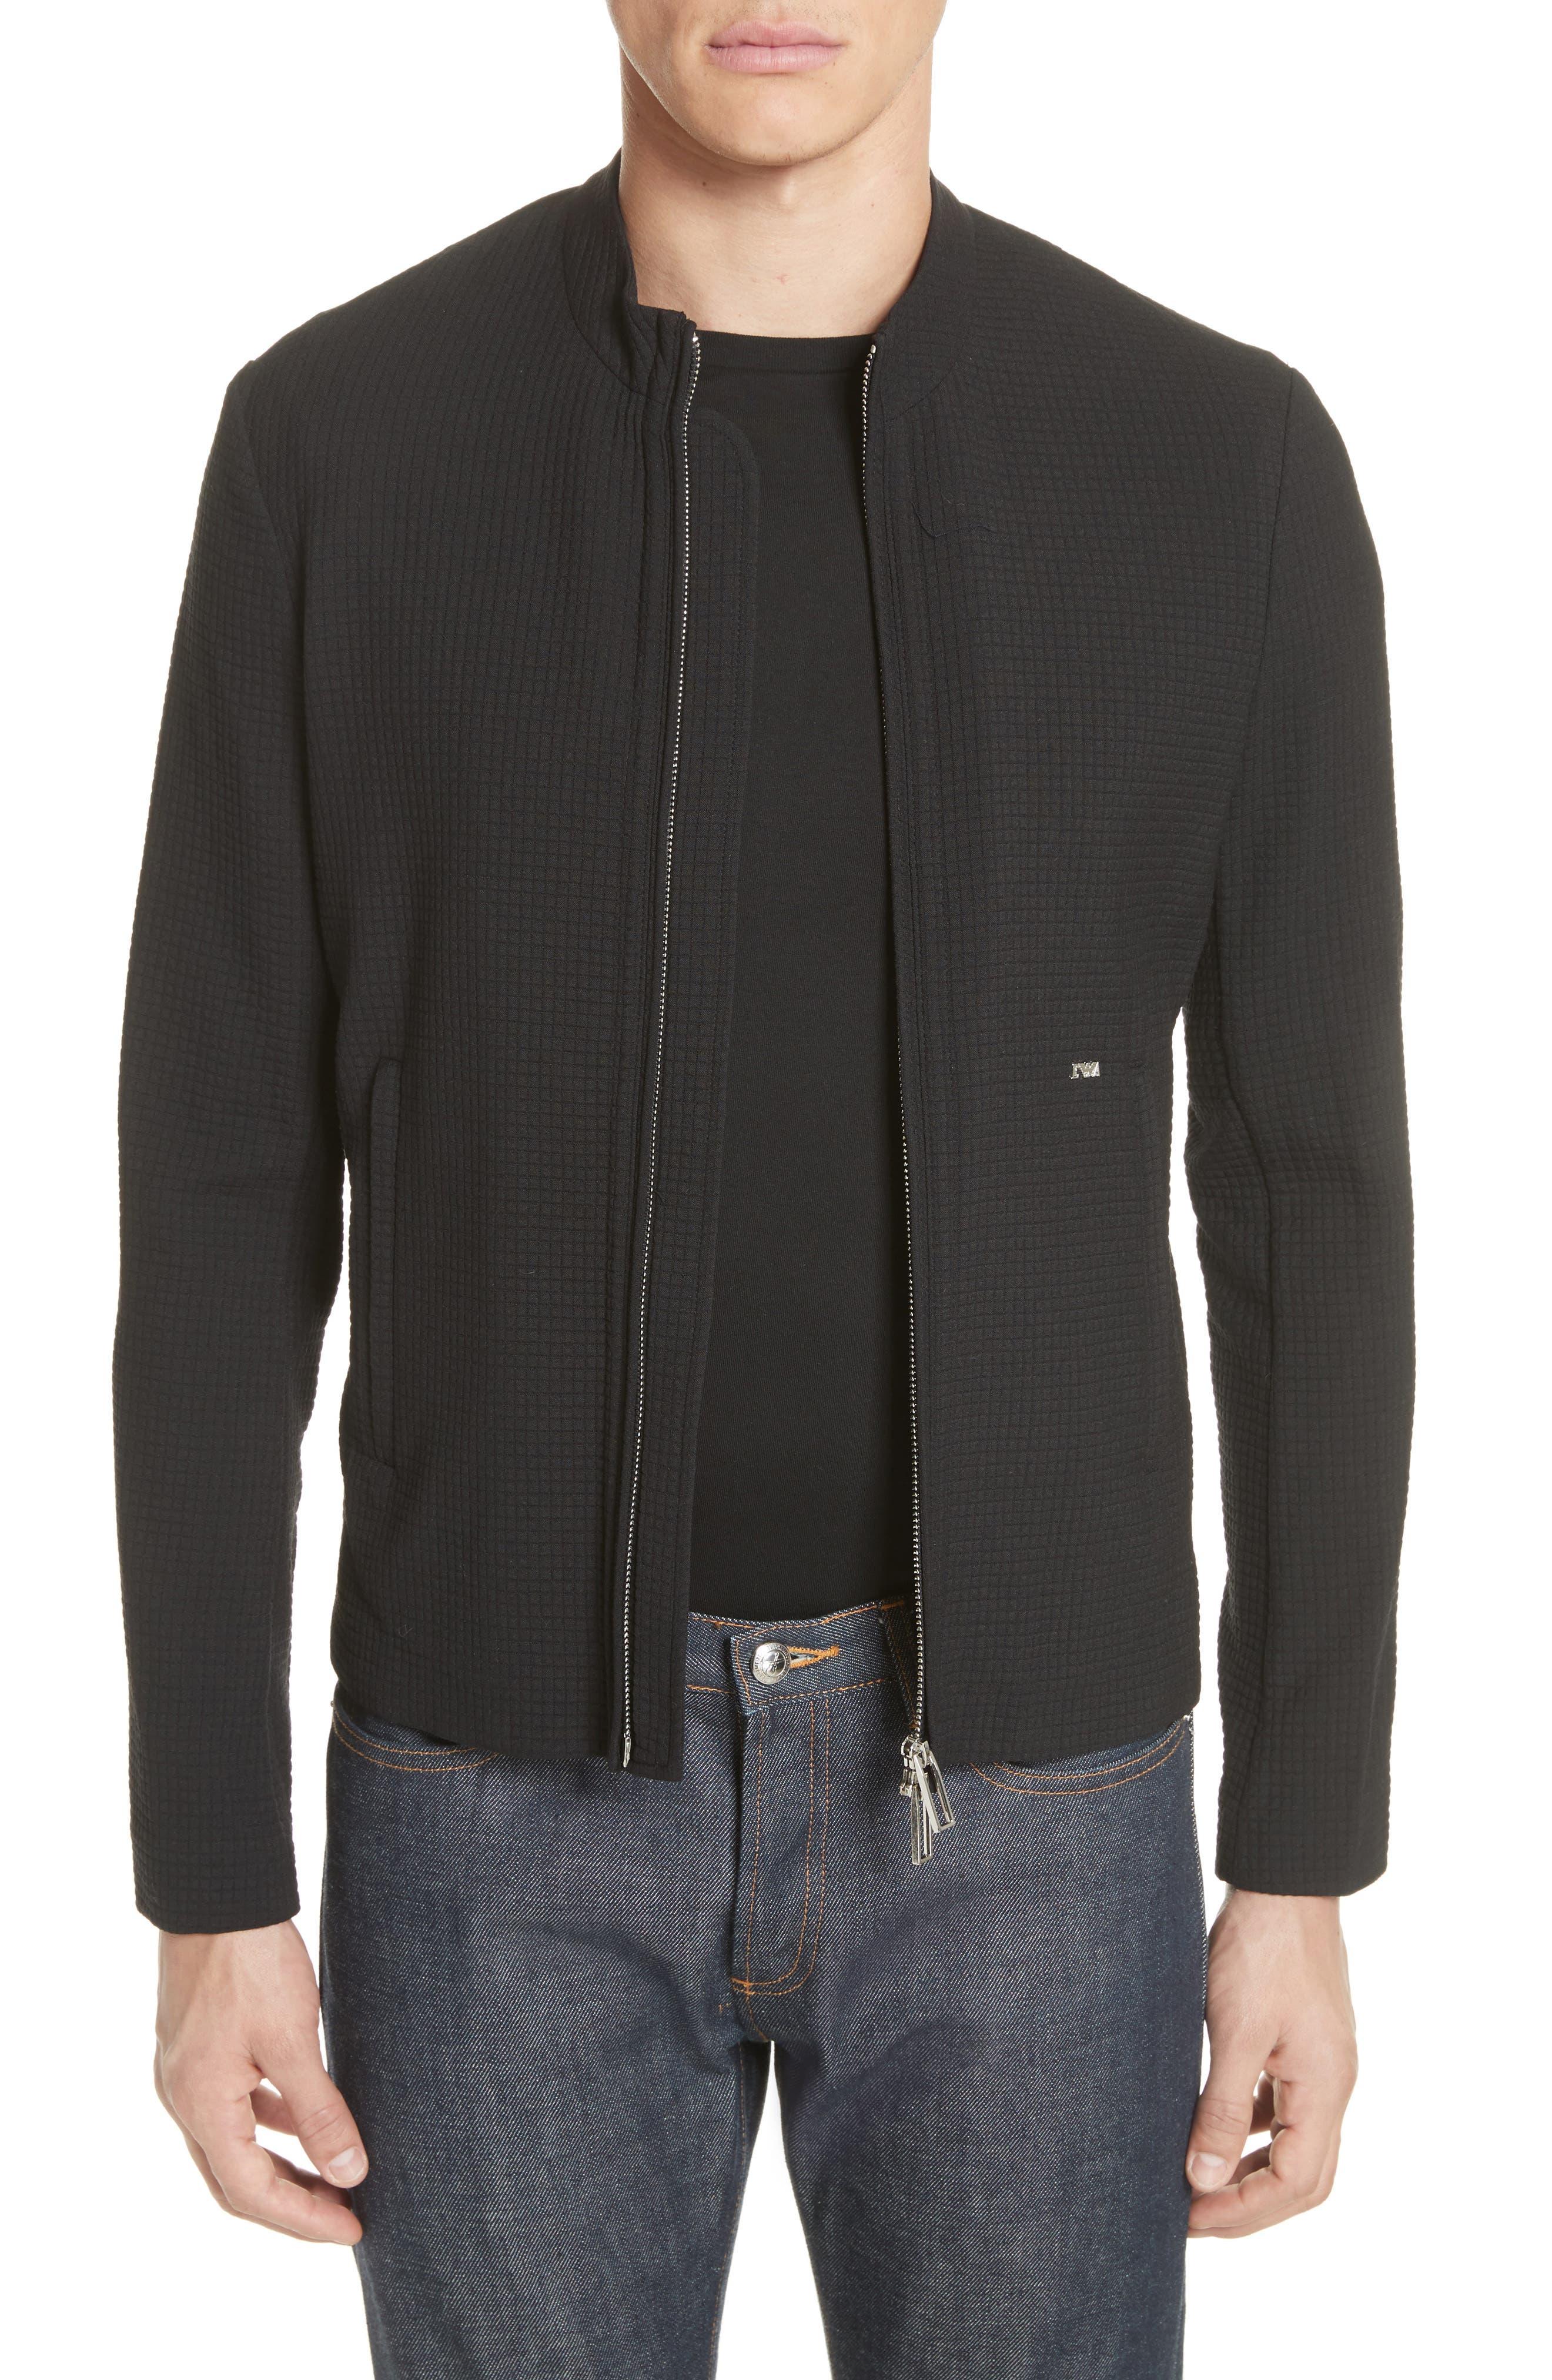 Emporio Armani Ripstop Check Wool Blend Jacket